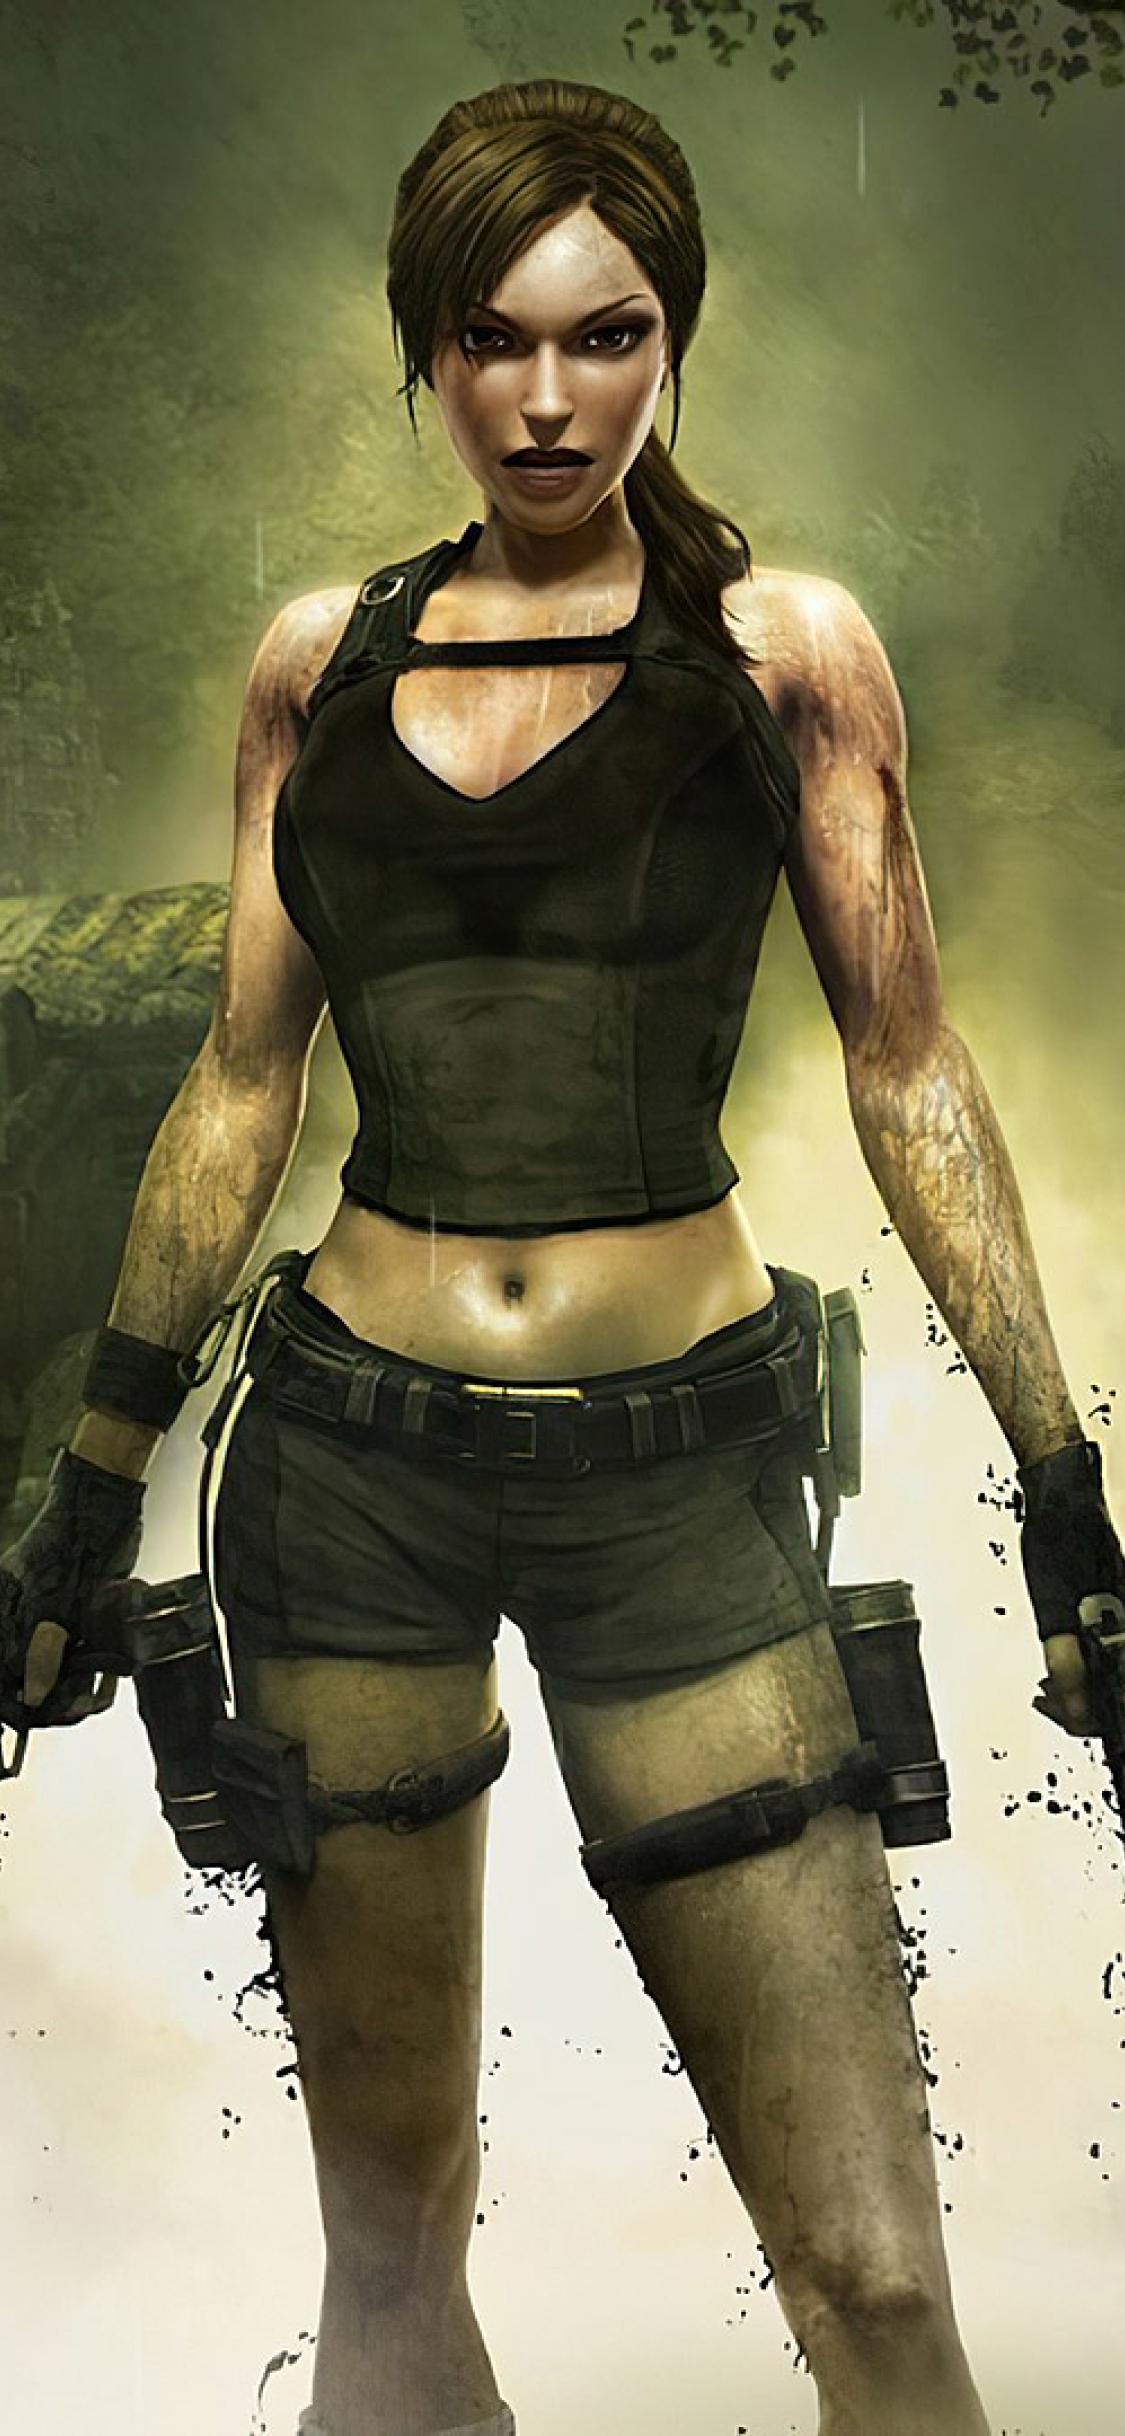 1125x2436 Tomb Raider Underworld Iphone XS,Iphone 10 ...